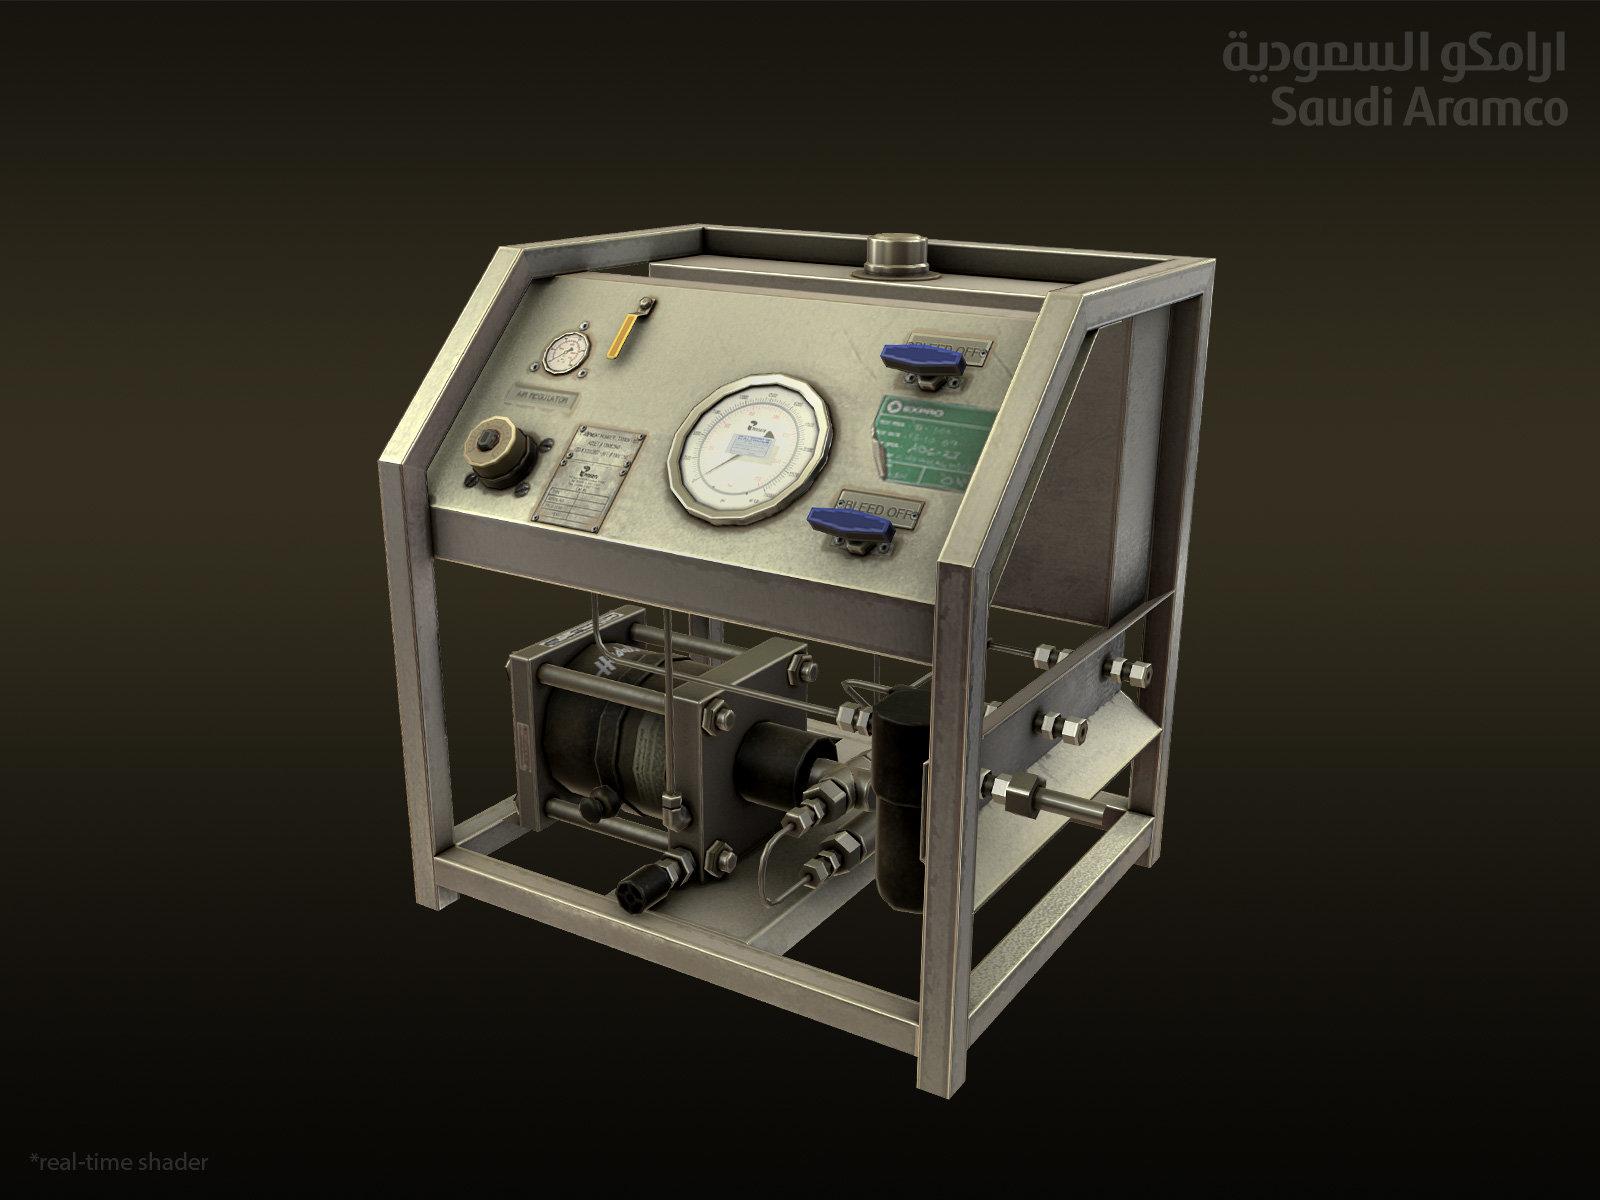 Demitry nemirovskiy control panel